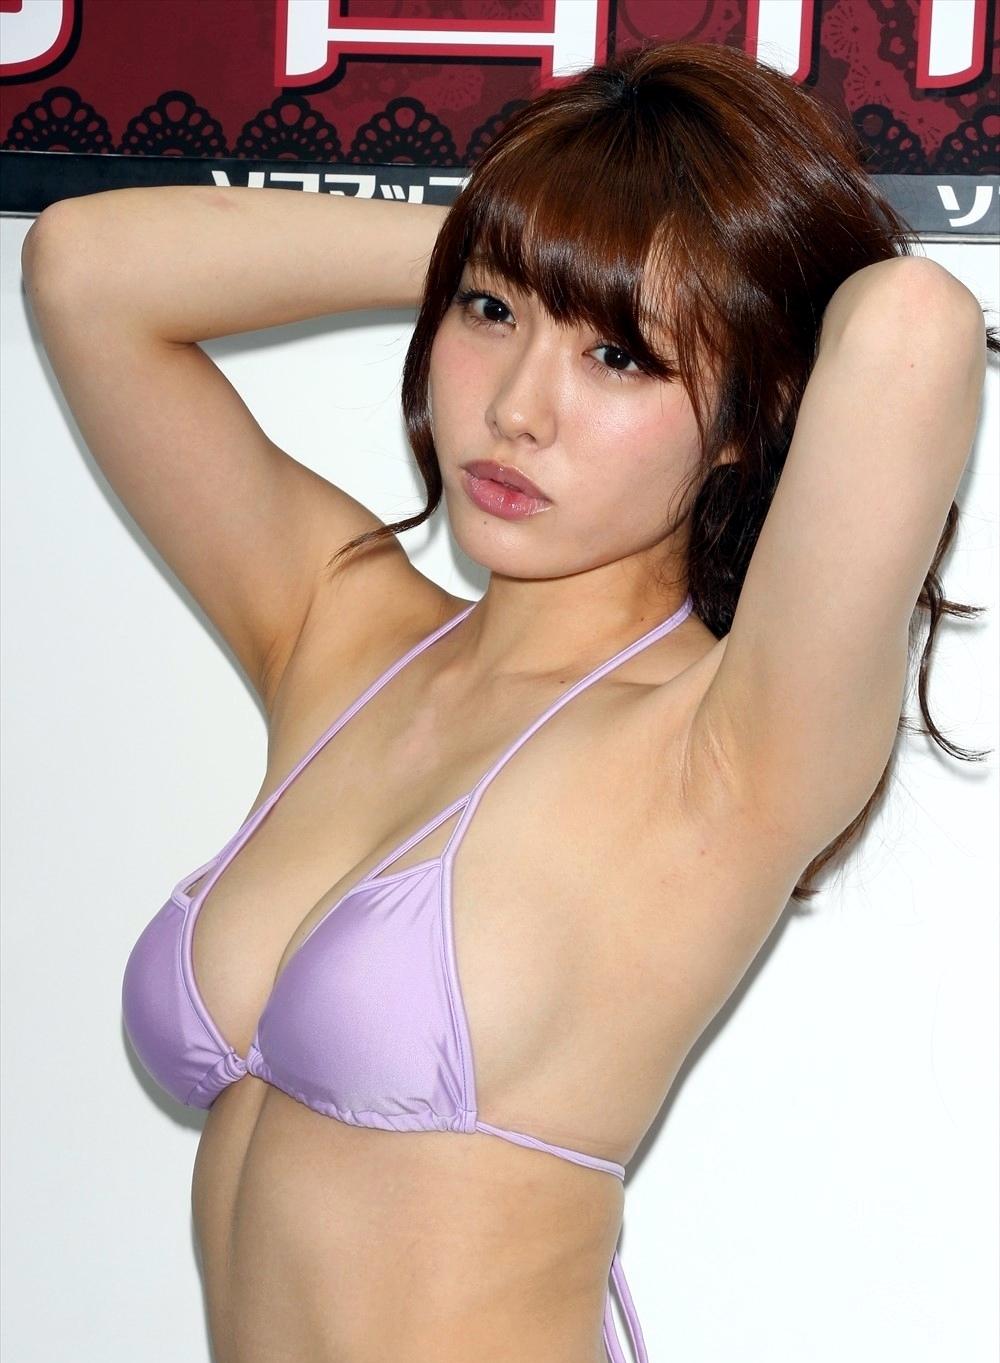 今野杏南の高画質美腋1 (4)